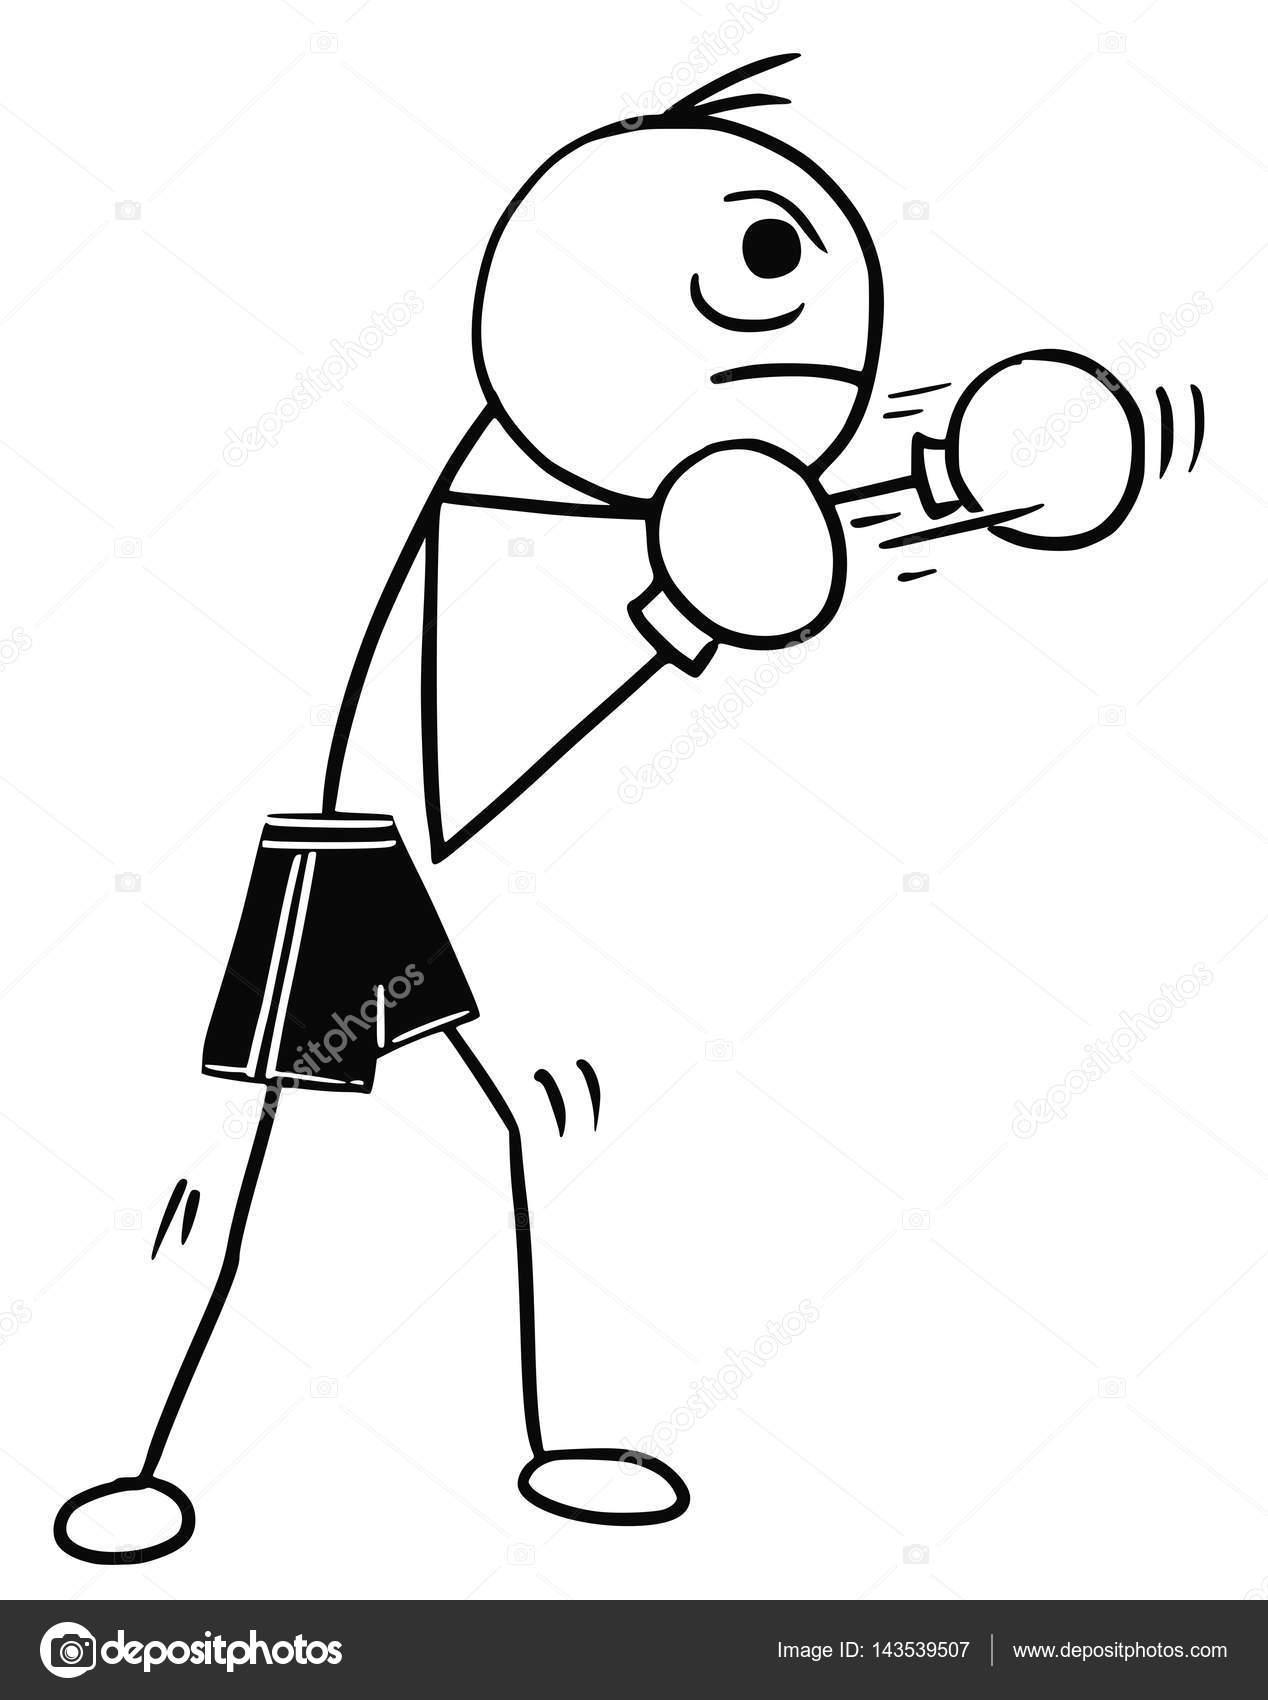 dibujos boxeo vector de dibujos animados de stickman de boxer con